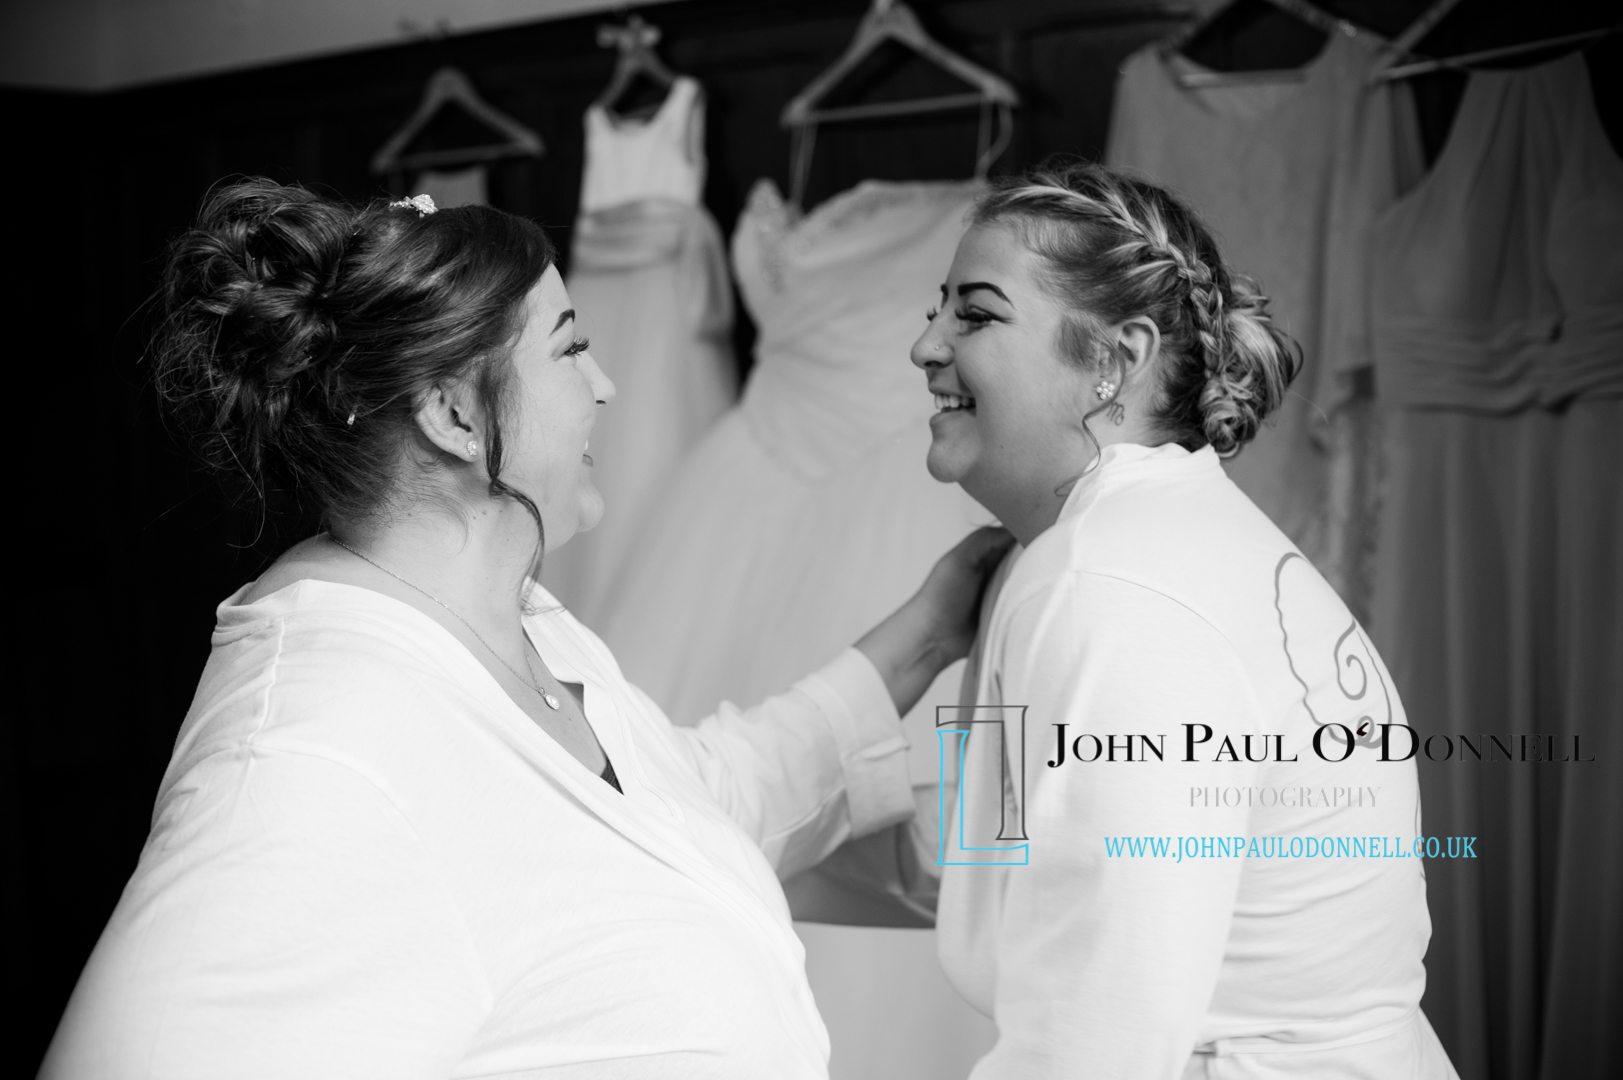 Kelly and Bradleys wedding at Fanhams Hall